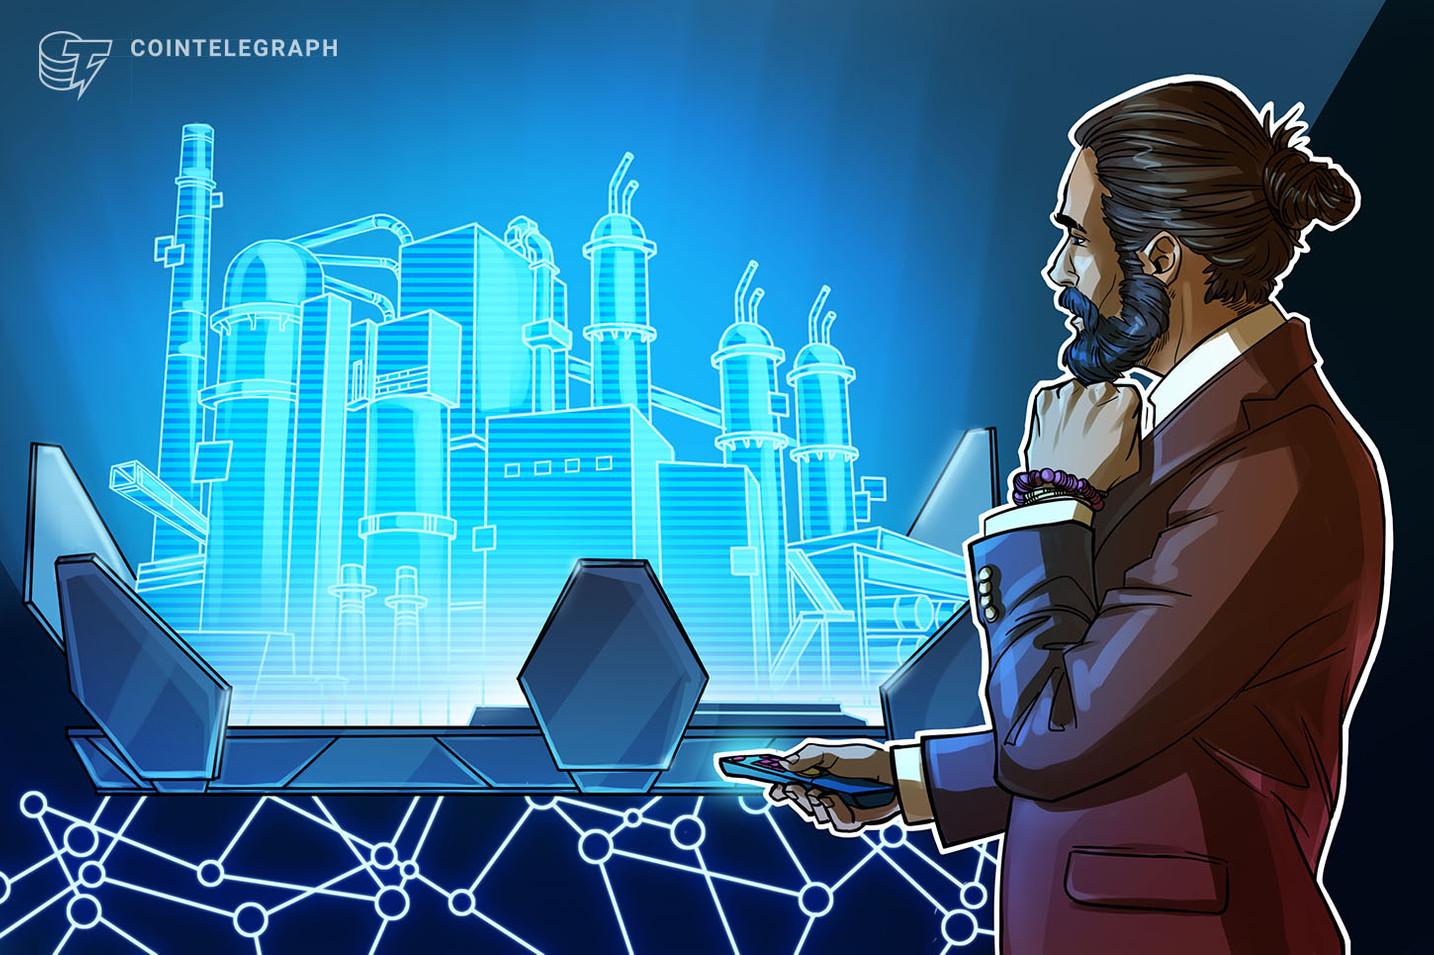 L'exchange di criptovalute Bakkt debutterà sui mercati azionari tramite una SPAC